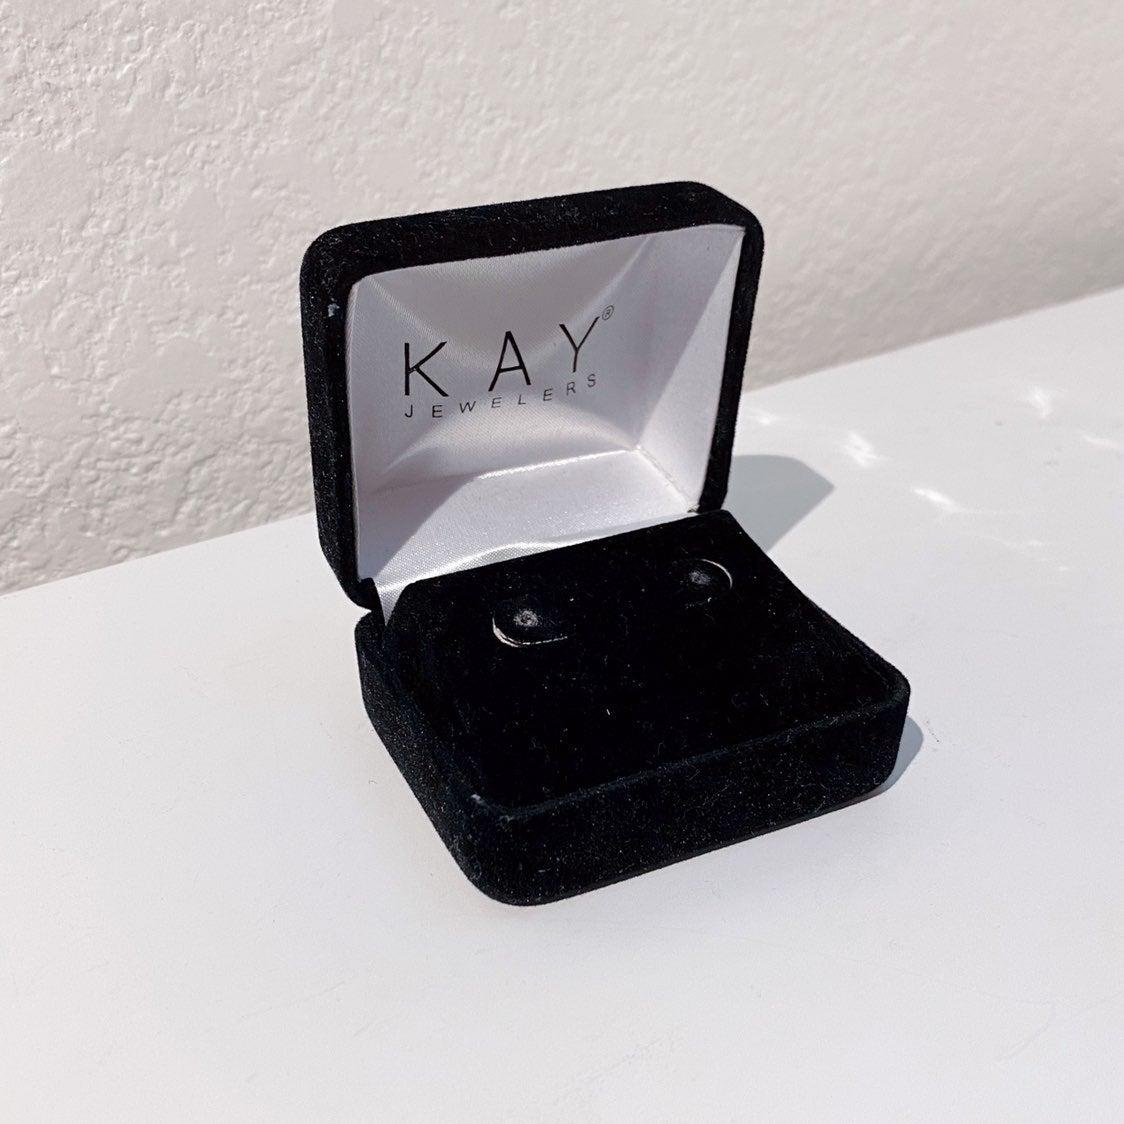 Kay Jewelers Earring Box